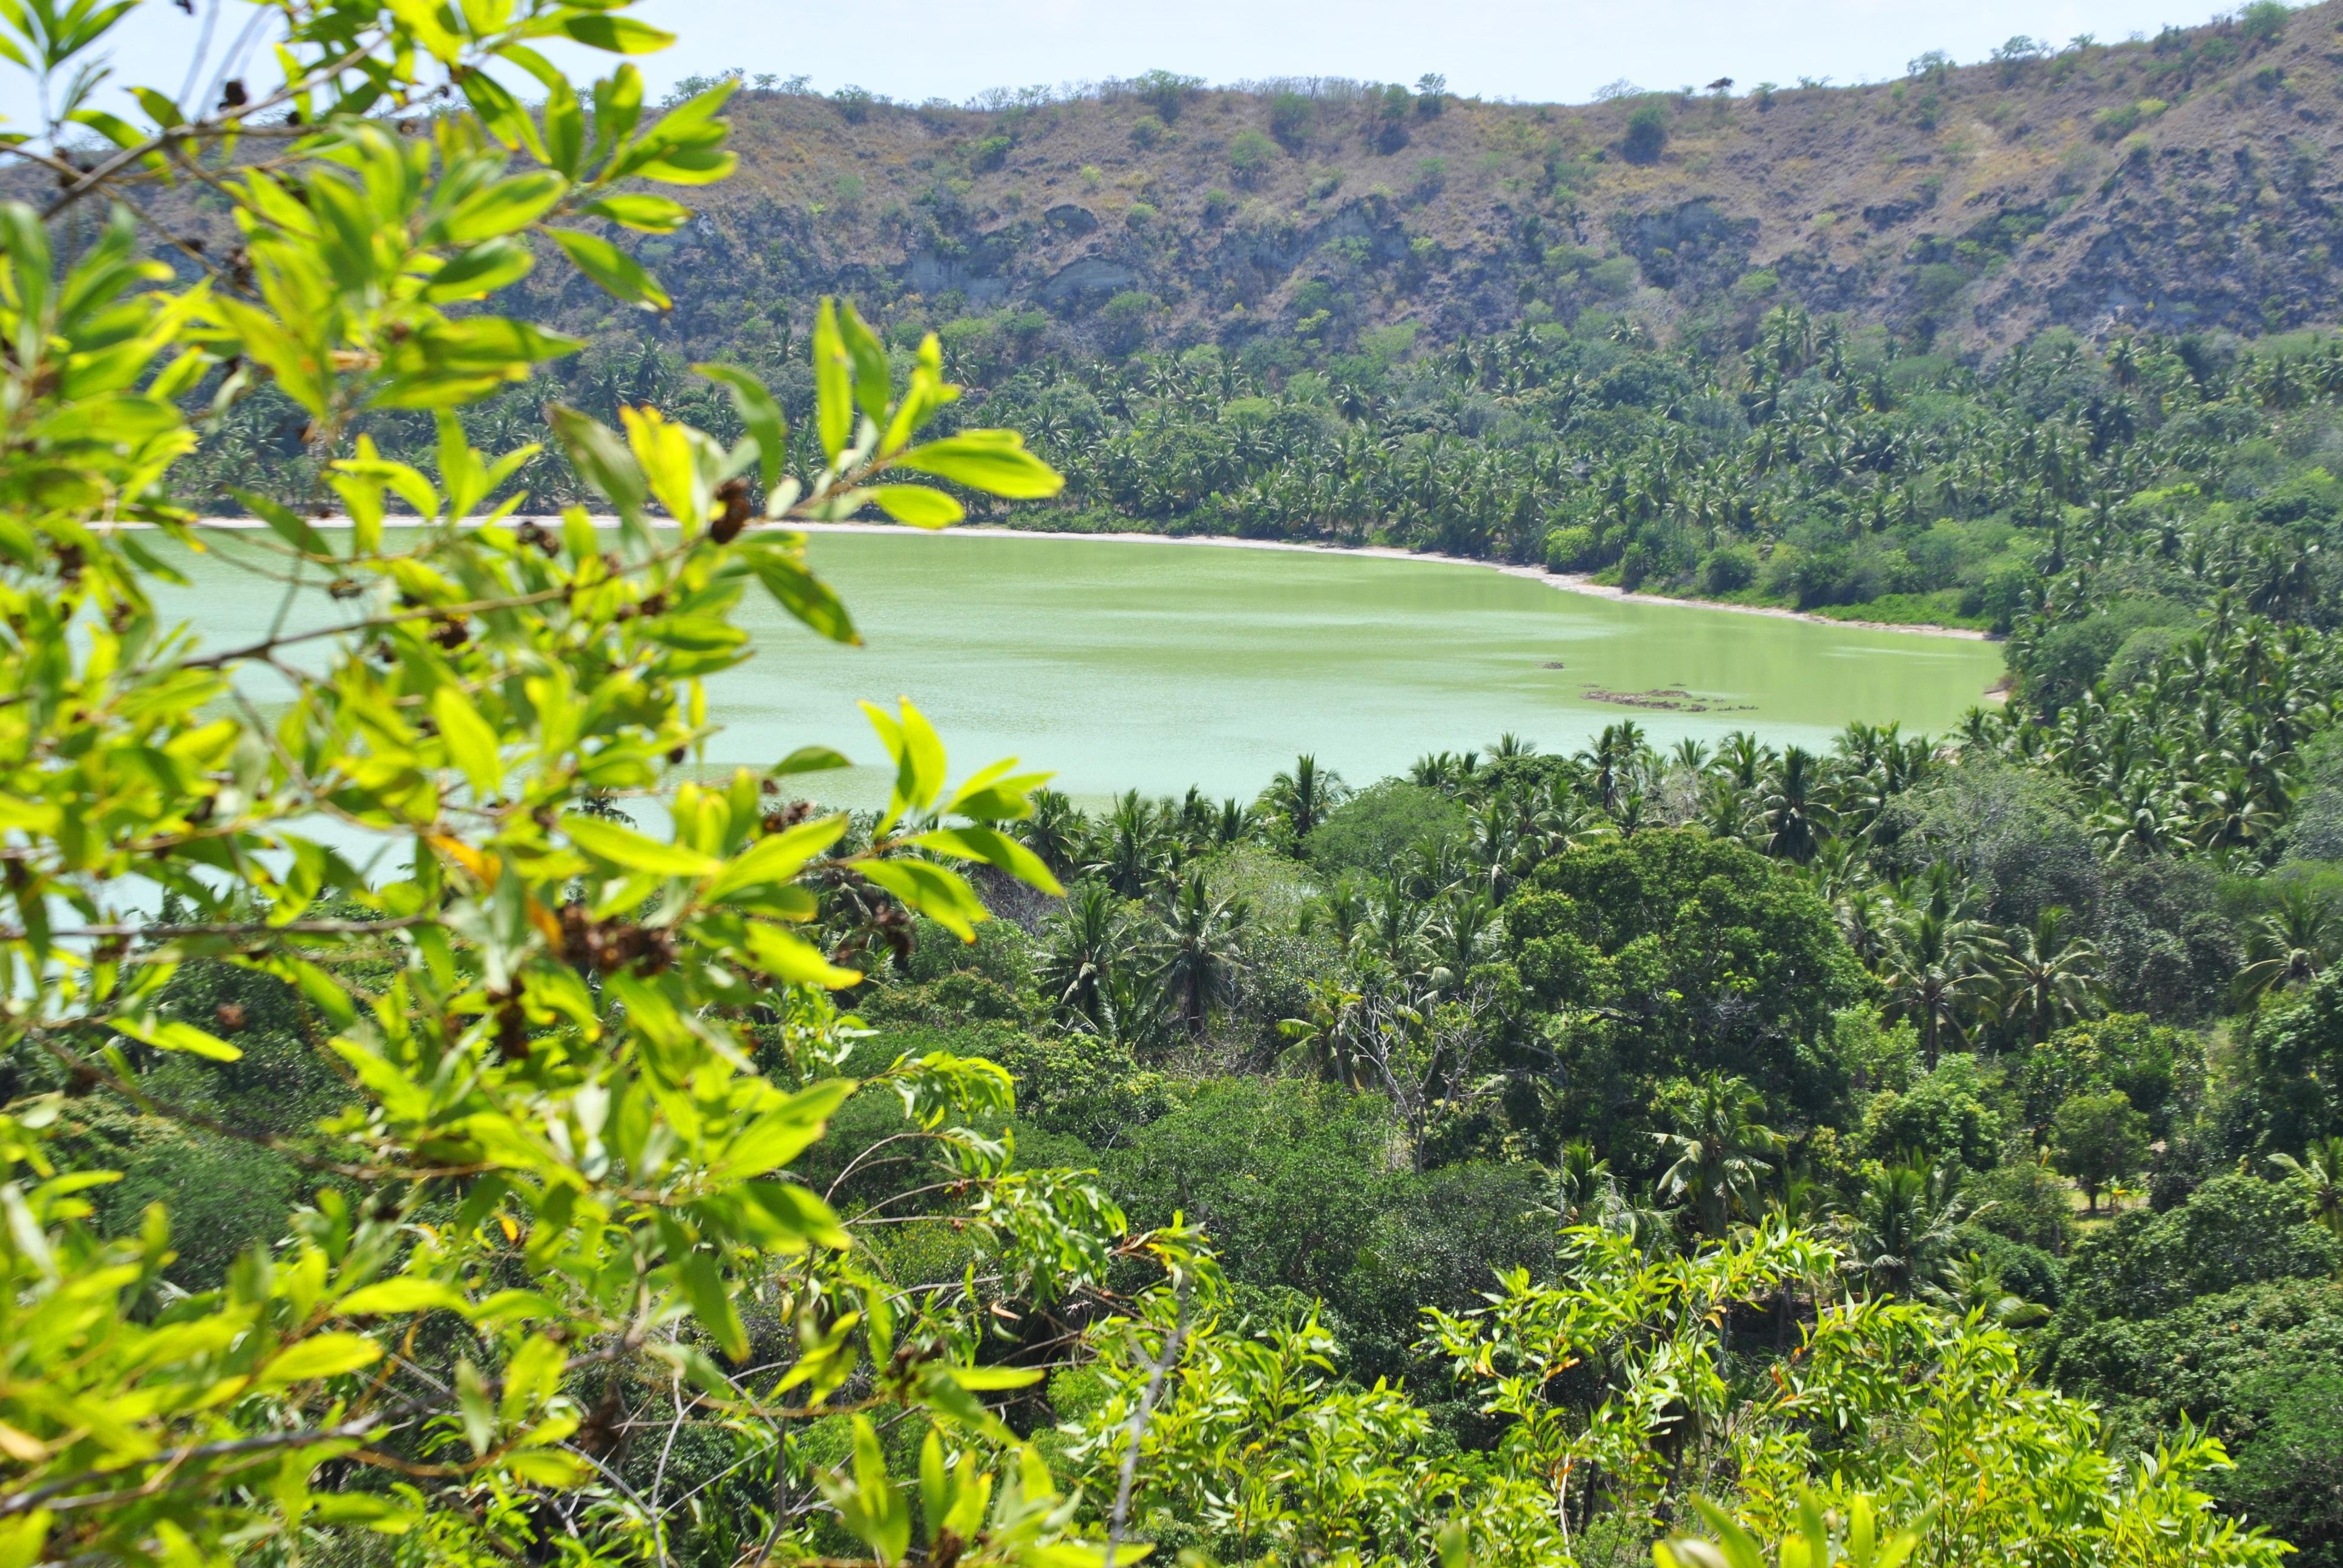 Dziani-søen på Petite-Terre